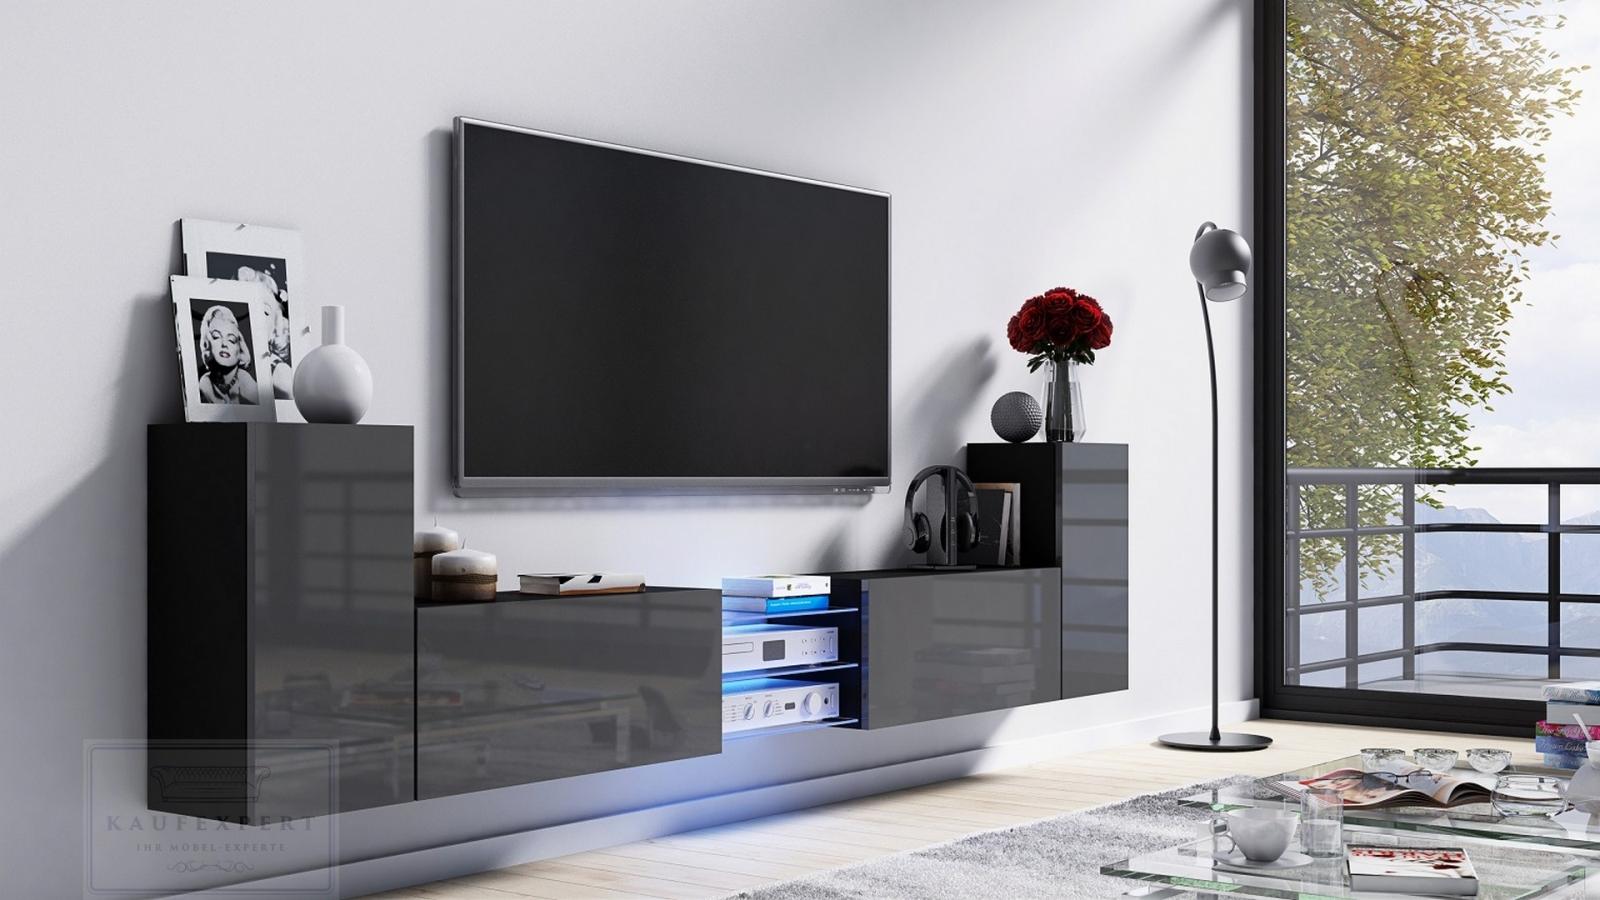 kaufexpert tv lowboard galaxy grau hochglanz schwarz mdf design board hifi tisch beleuchtung. Black Bedroom Furniture Sets. Home Design Ideas